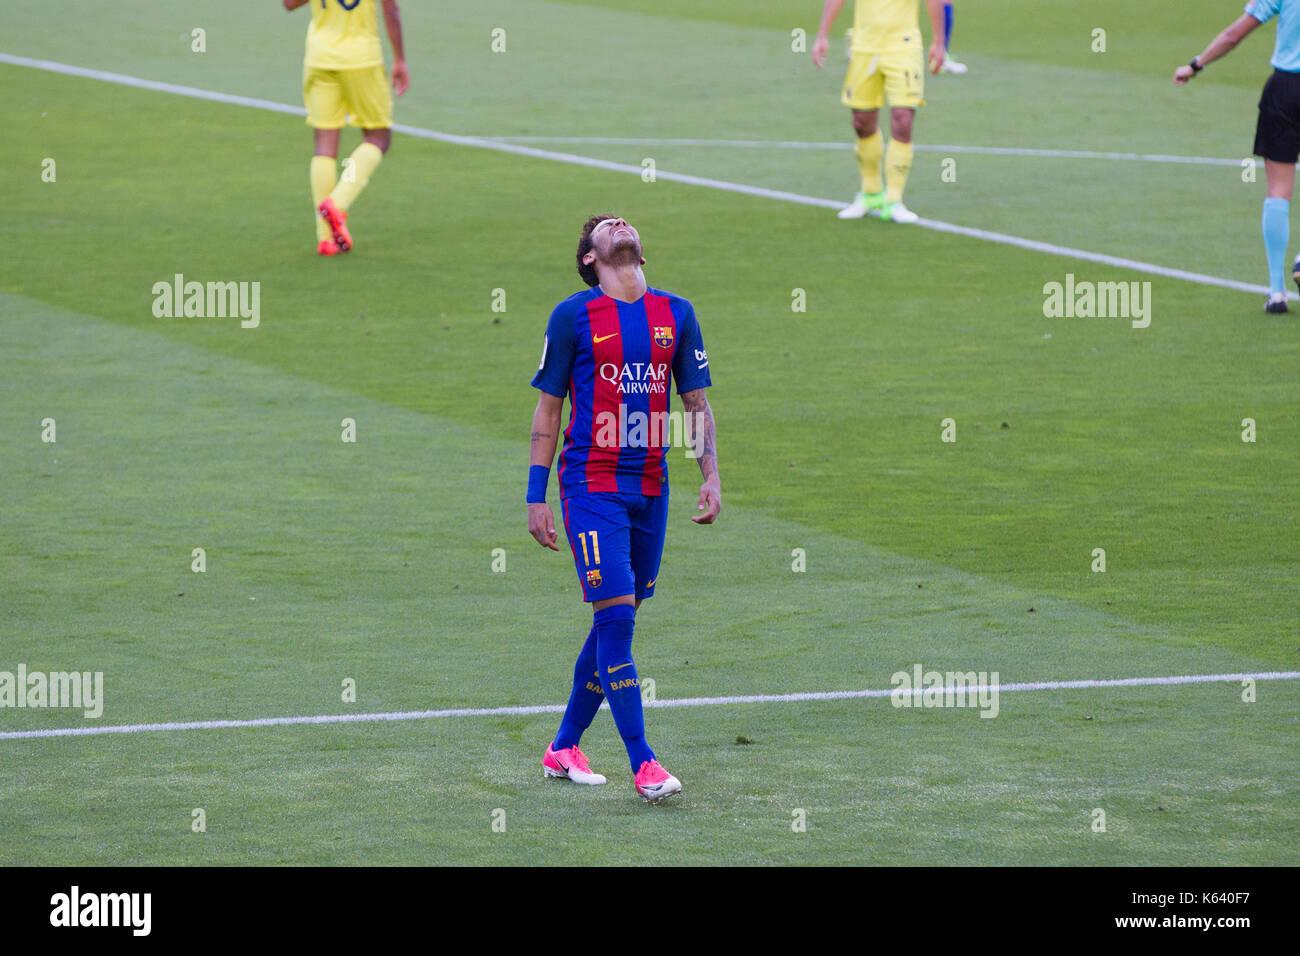 Neymar Jr- 6/5/17 Barcelona v Villarreal football league match at the Camp Nou stadium, Barcelona. - Stock Image